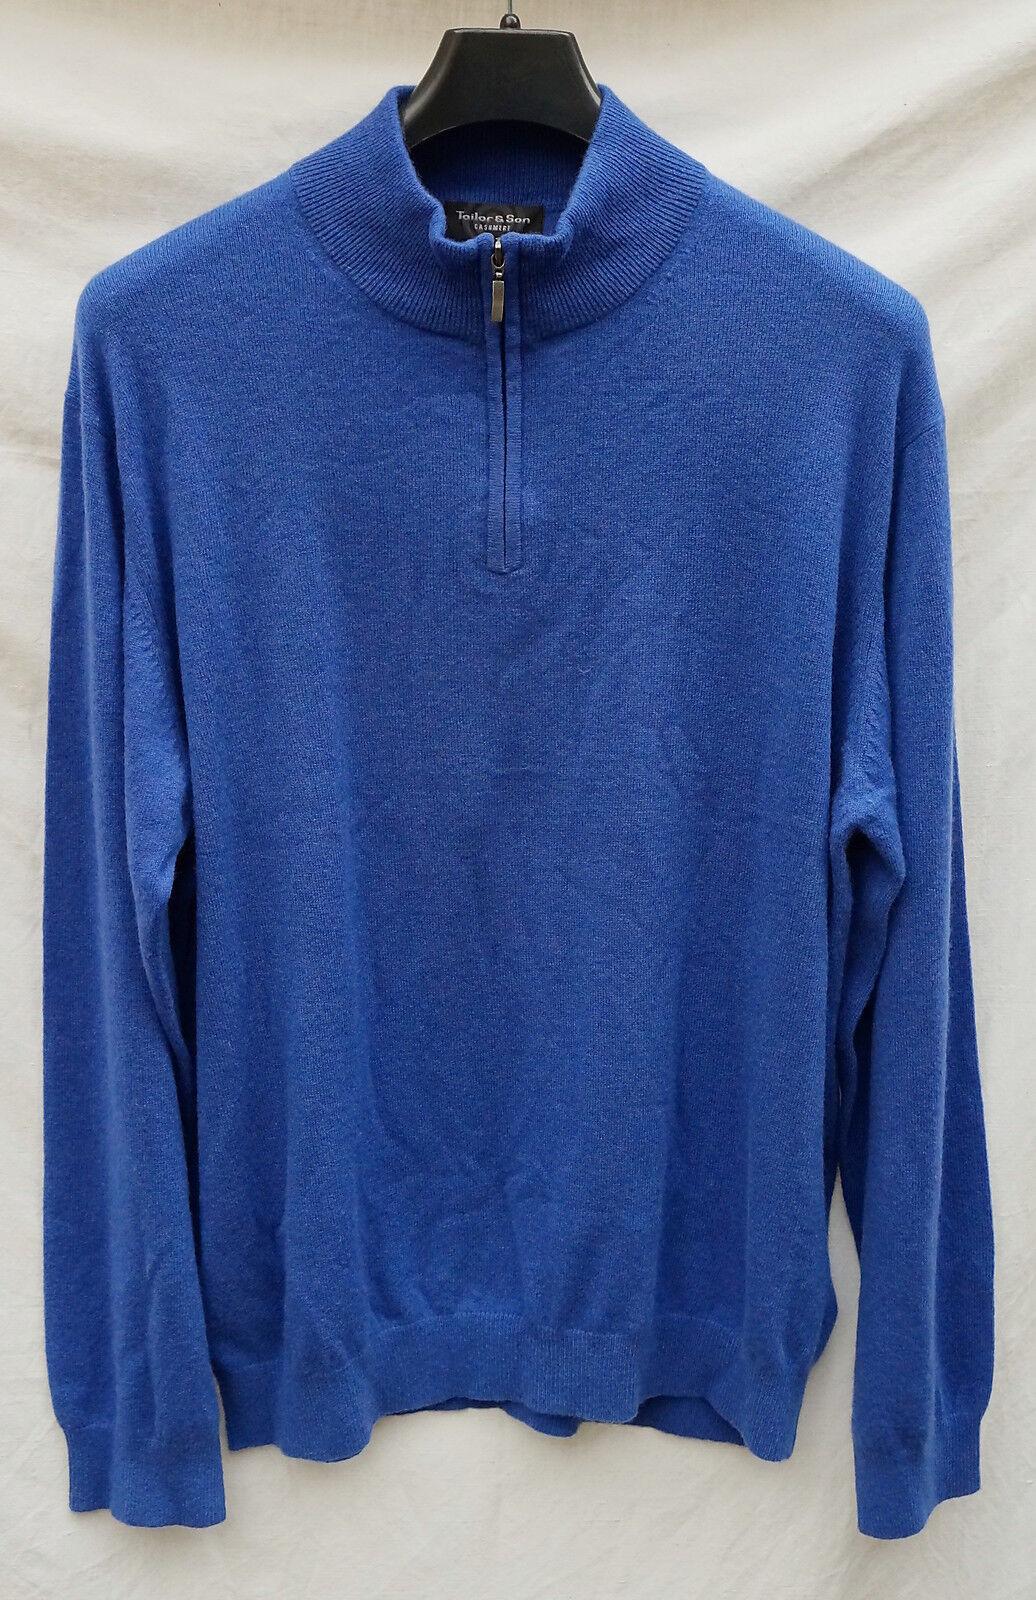 100% Kaschmir Herren Troyer Gr.XL royalblau TAILOR& SON  Pullover  blau MARITIM